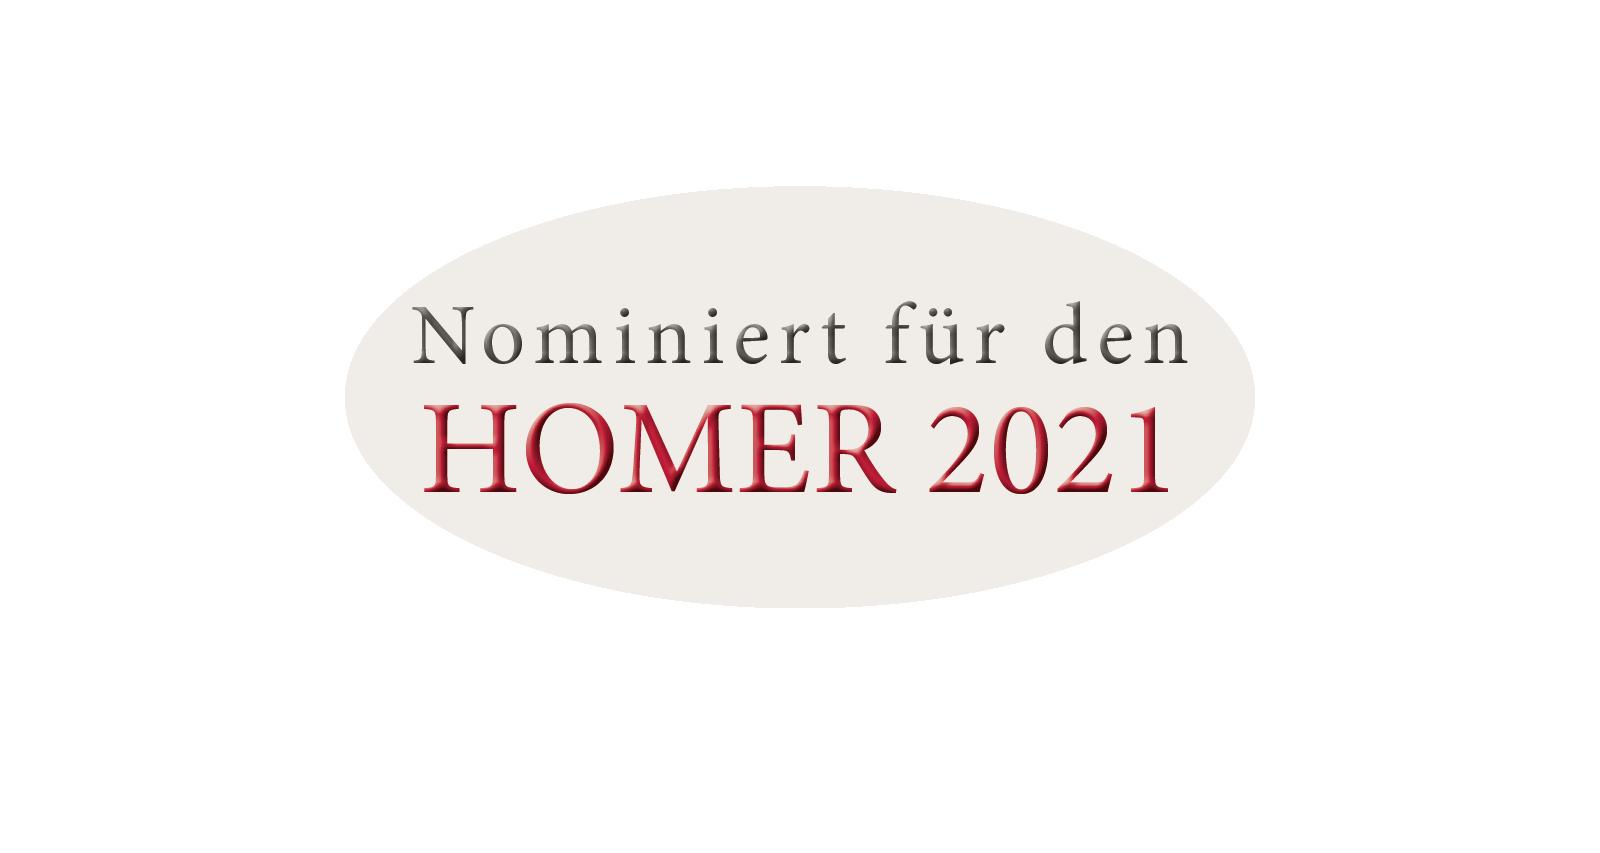 Nominiert HOMER 2021 Button